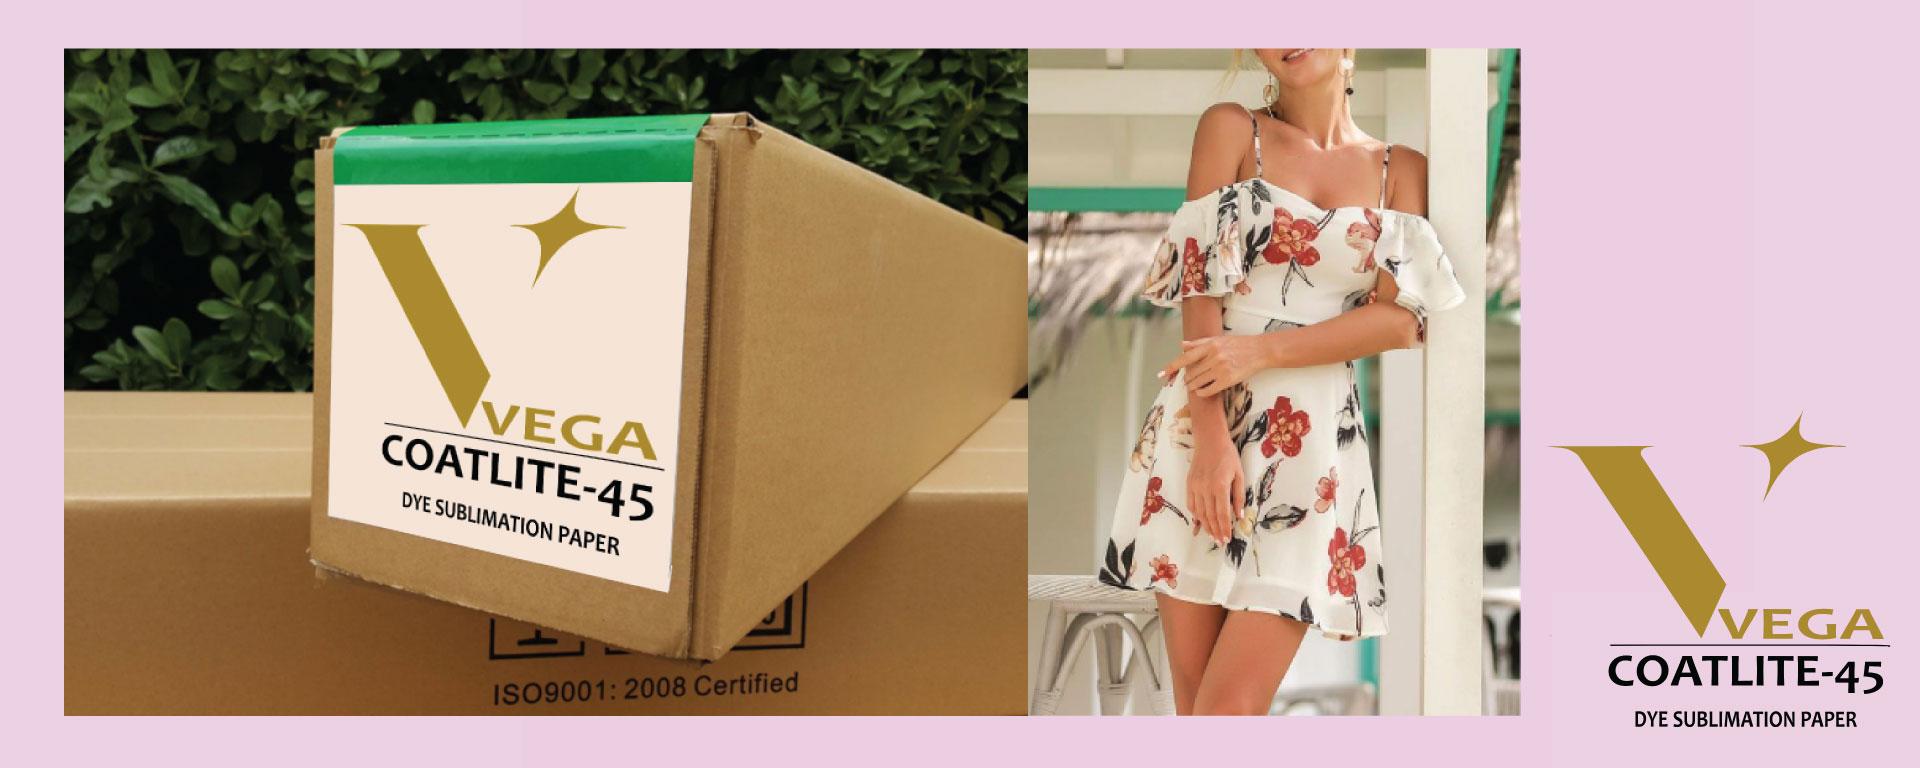 vega-coatlite-45gr-sublimasyon-kagidi-sublimation-paper-vega-dijital-sema-muratoglu